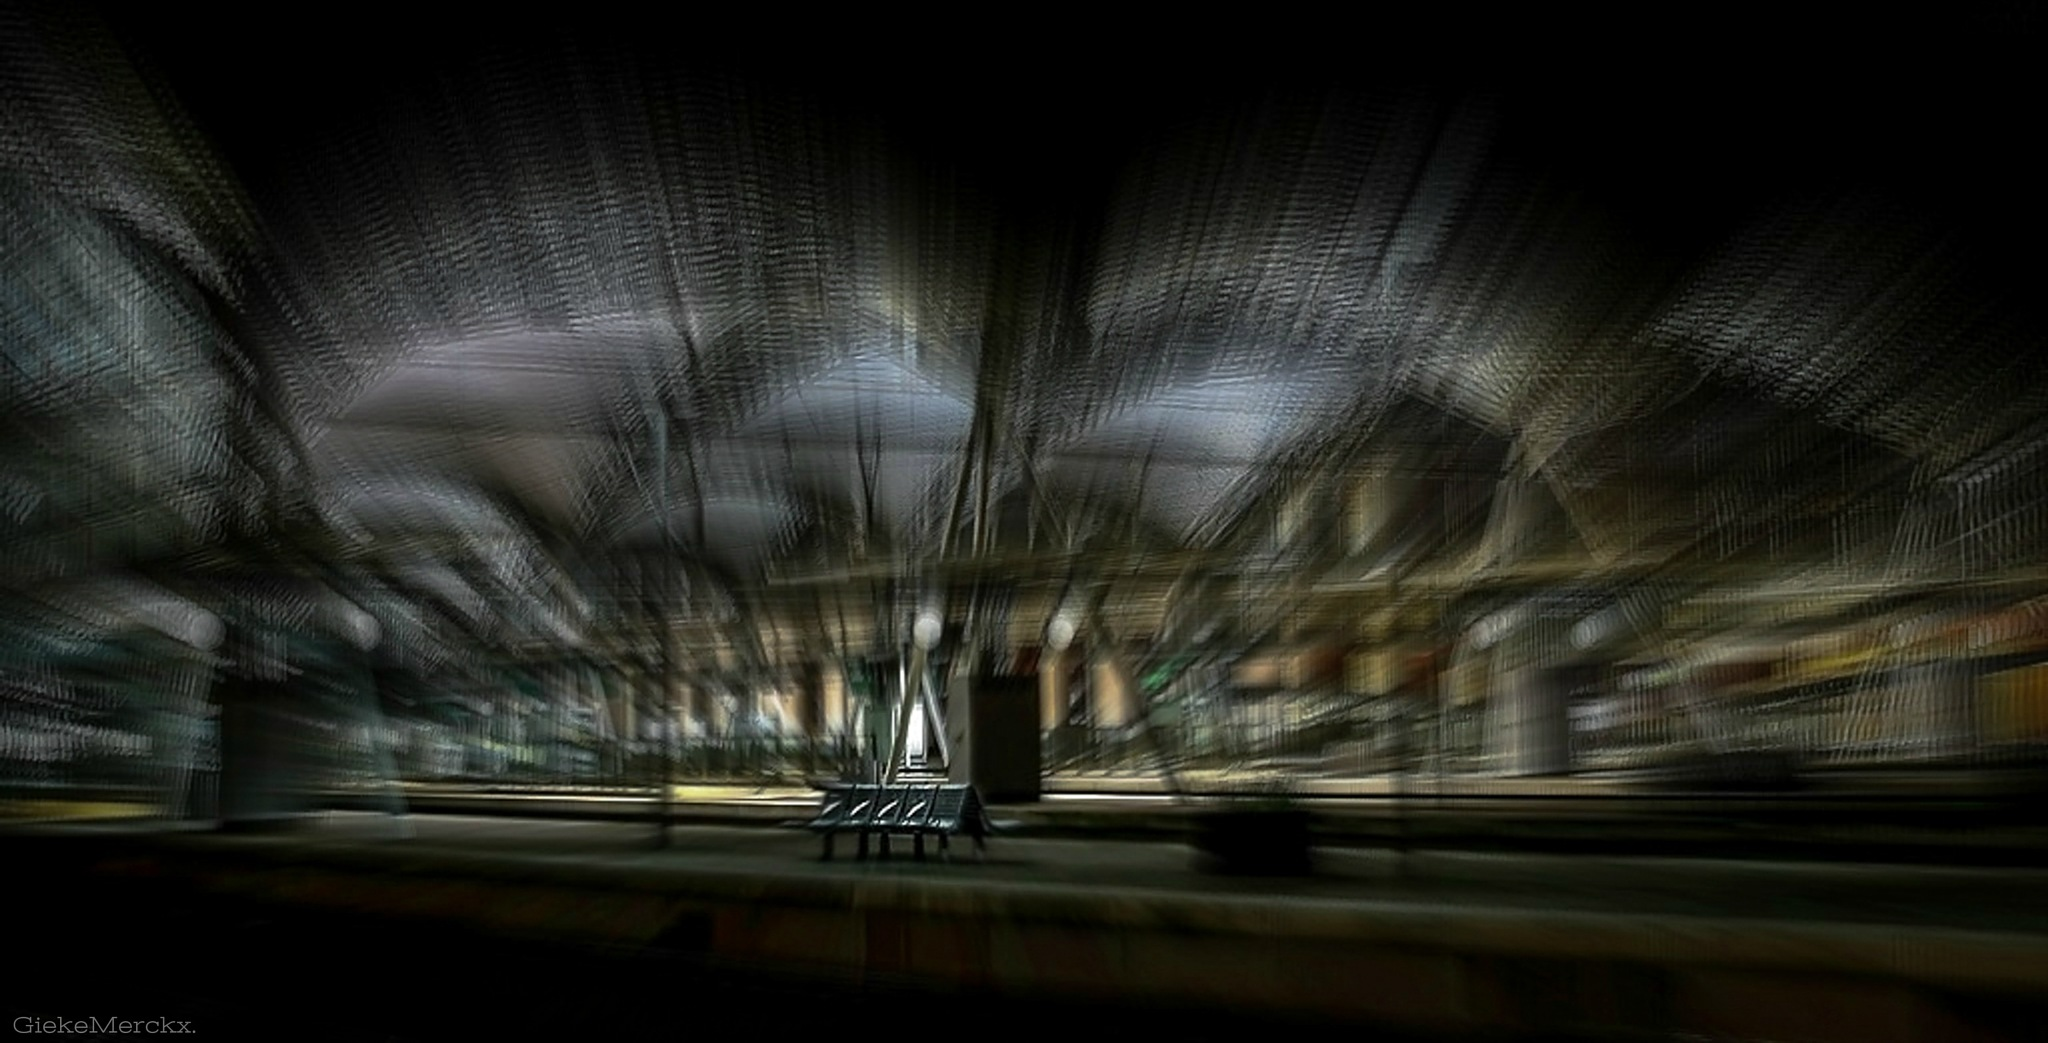 Station Leuven ( Belgium ). by GiekeMerckx